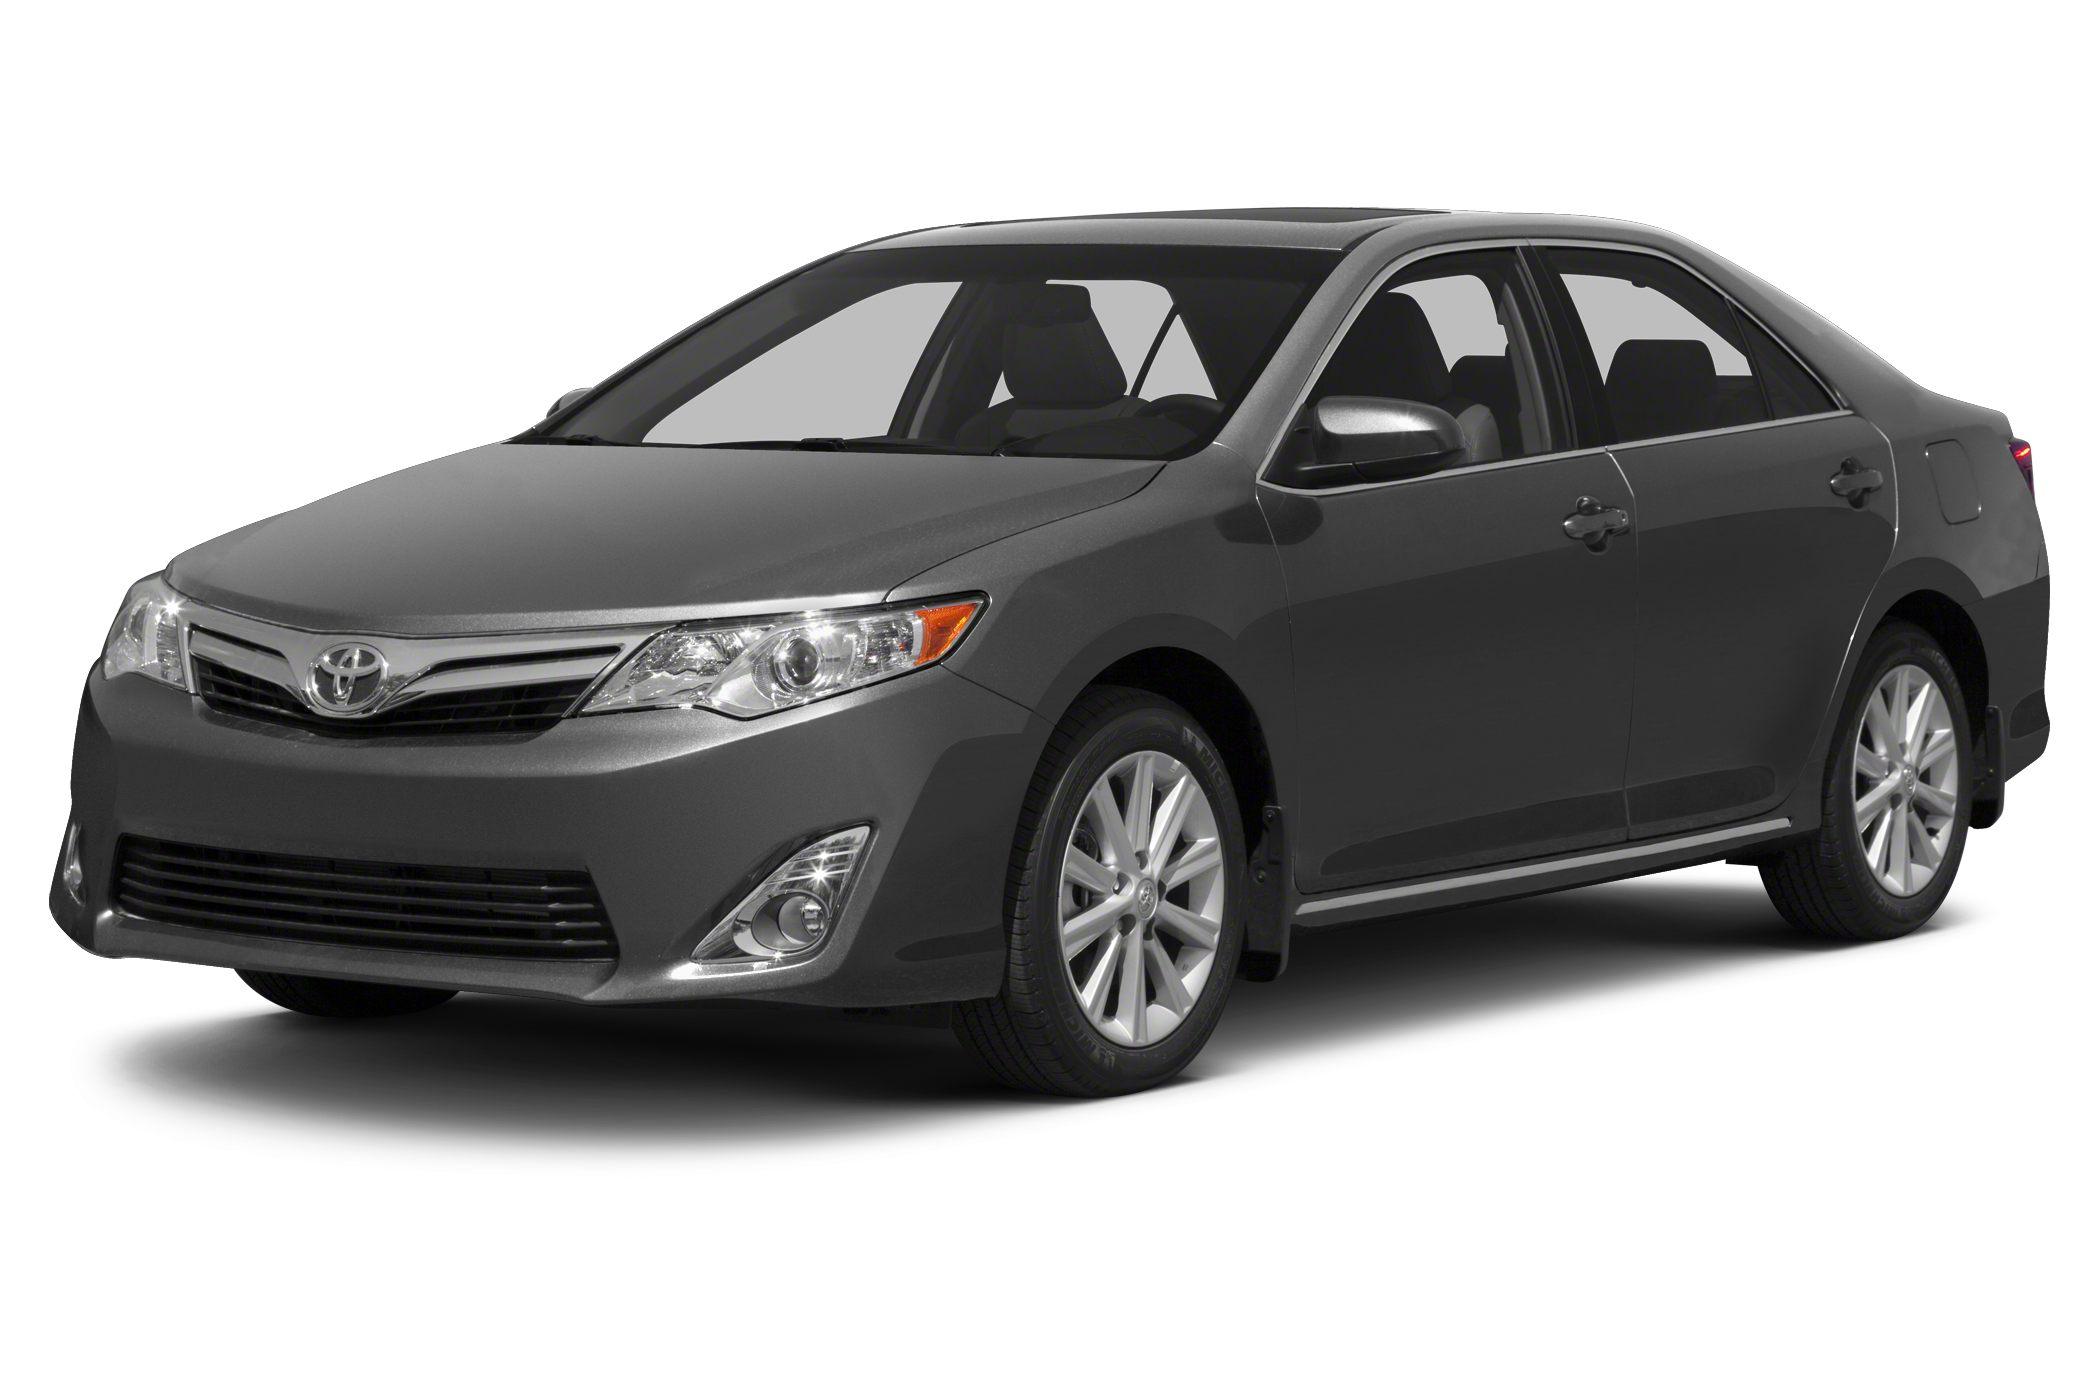 2017 Toyota Camry Recalls